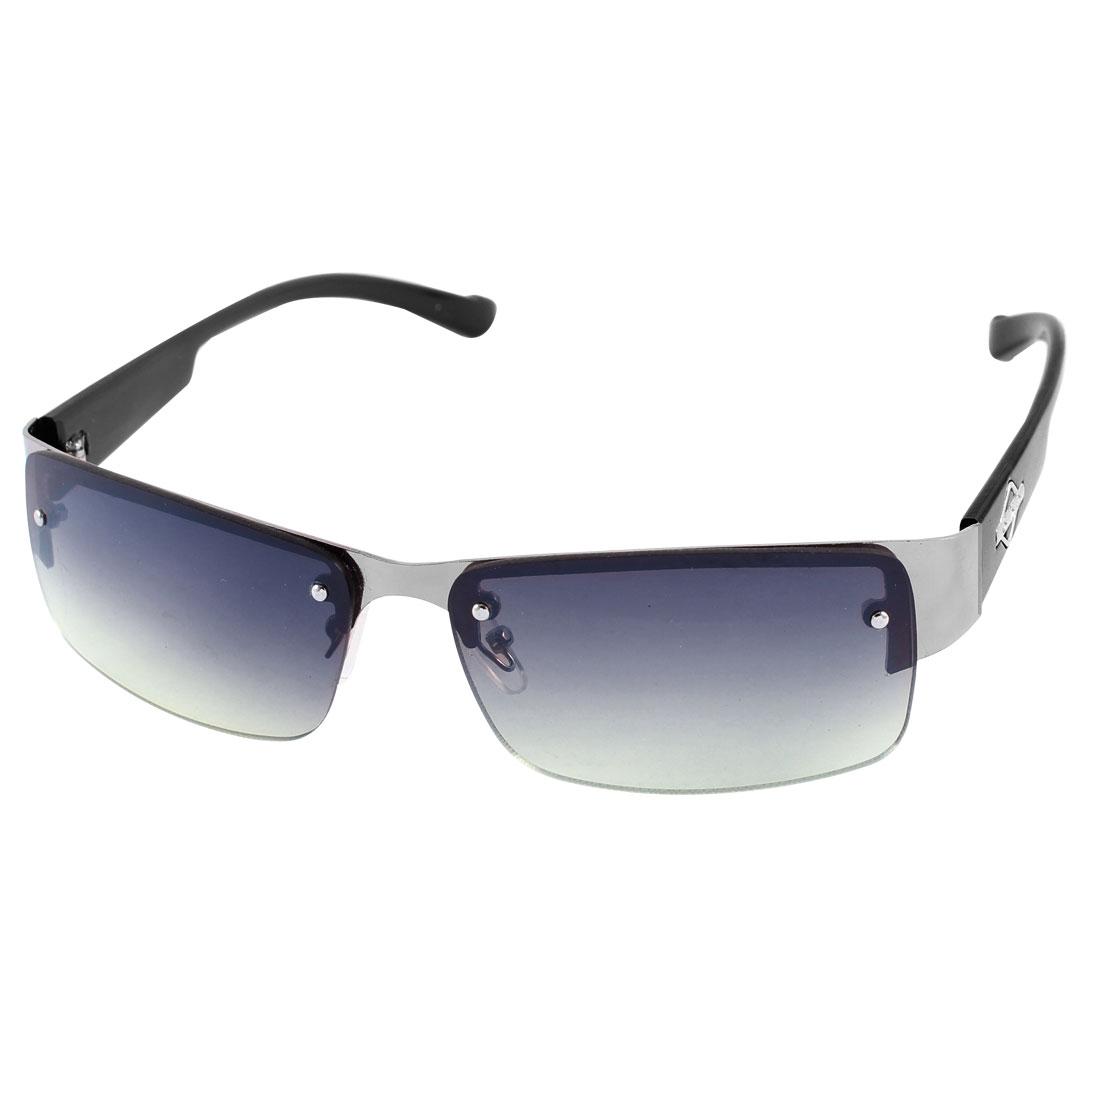 Plastic Metal Sunglasses Outdoor Eyekeeper Protective Eyewear for Lady